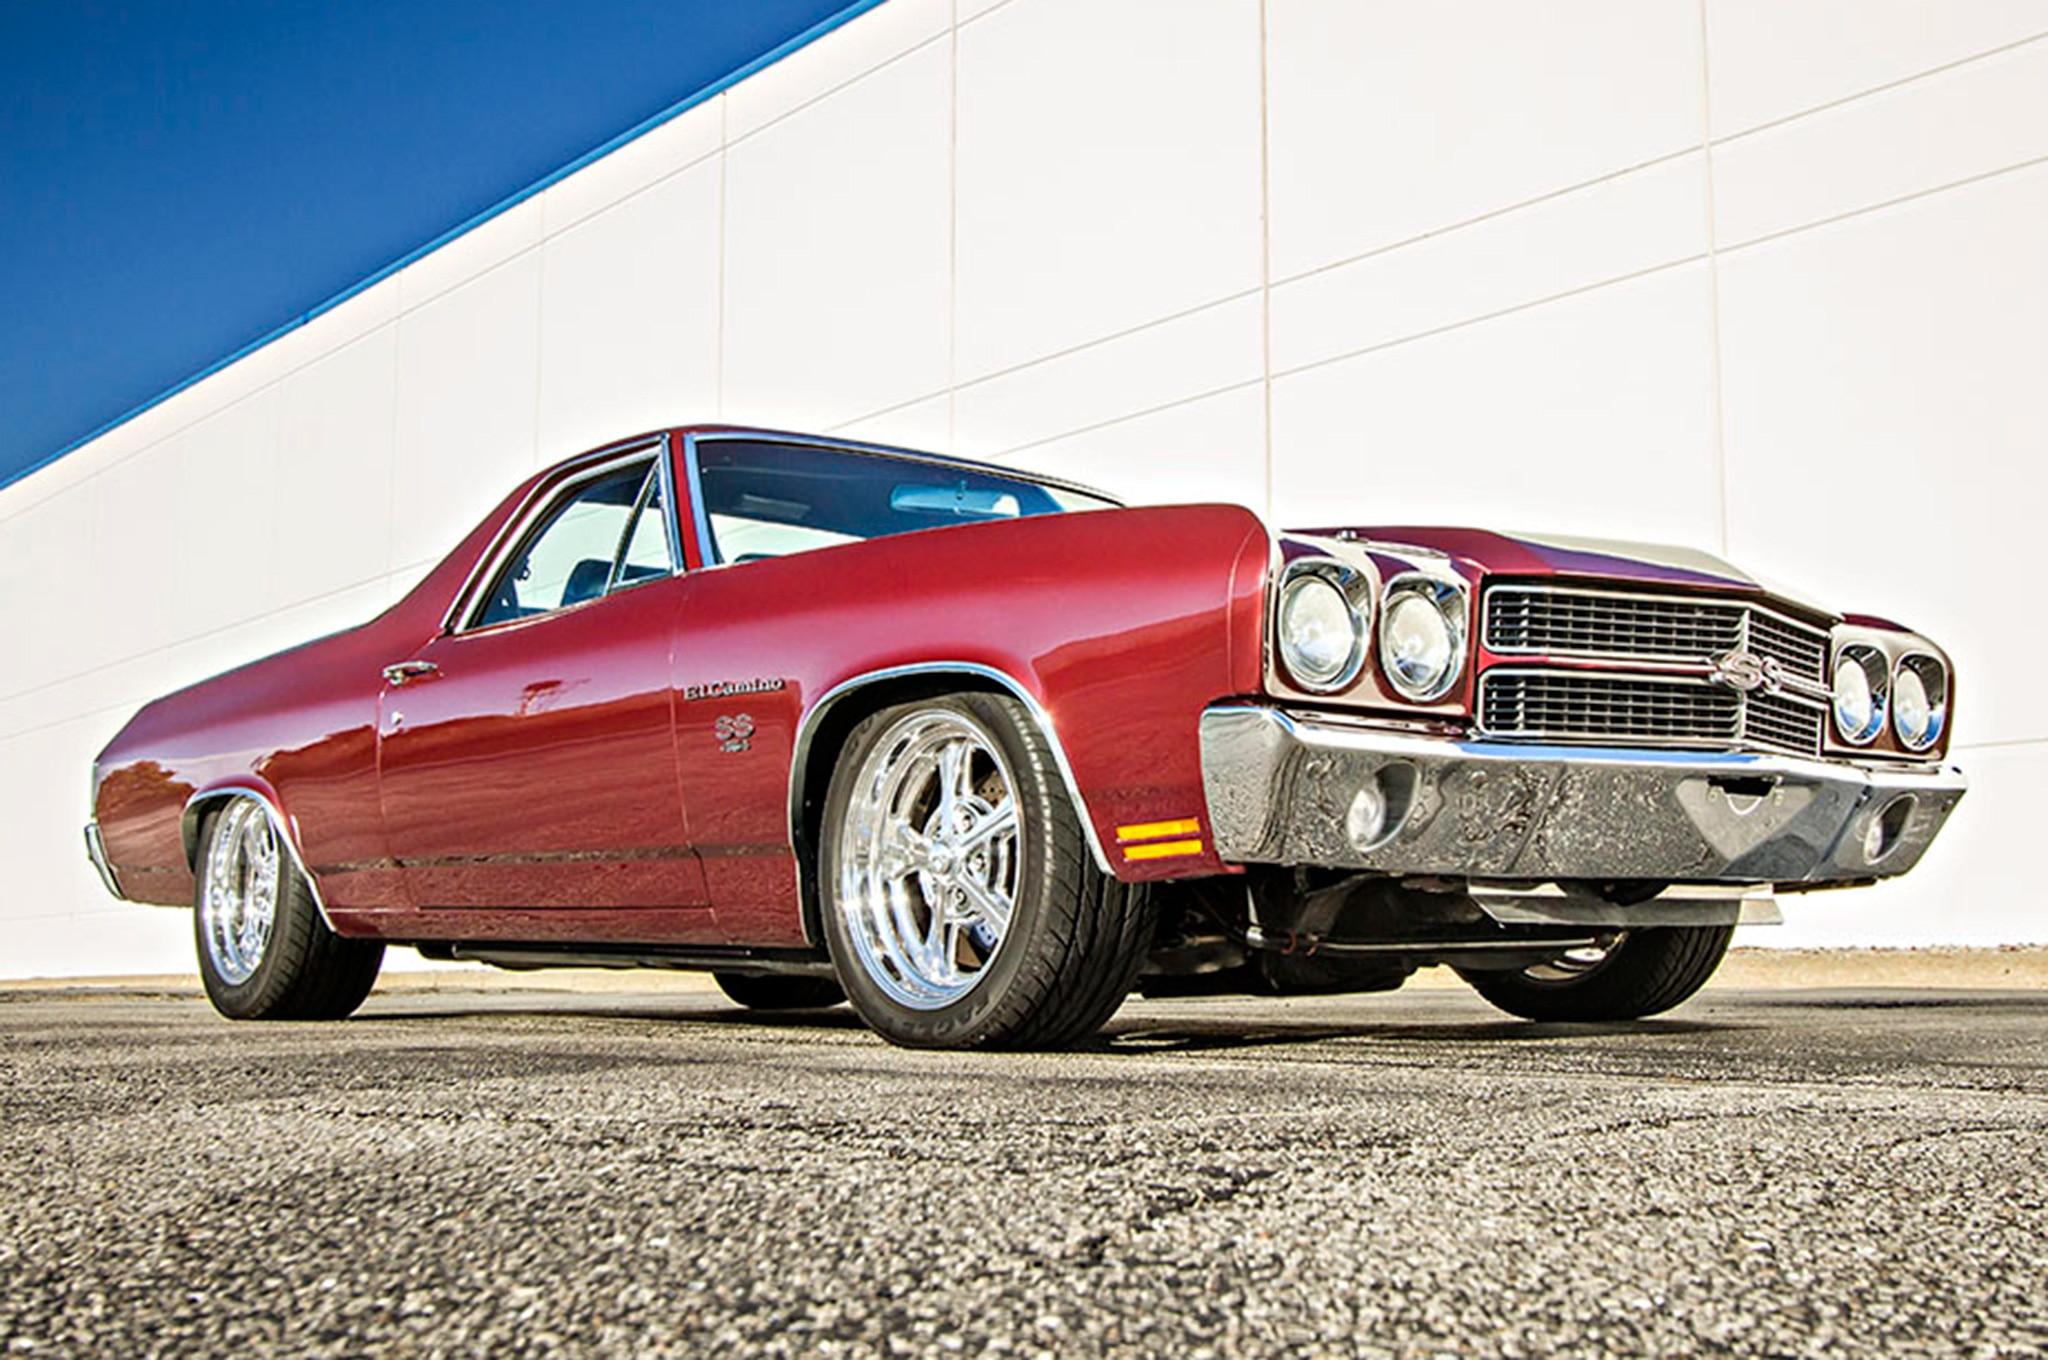 How e Enthusiast Built a 500 HP 1970 Chevrolet El Camino SS